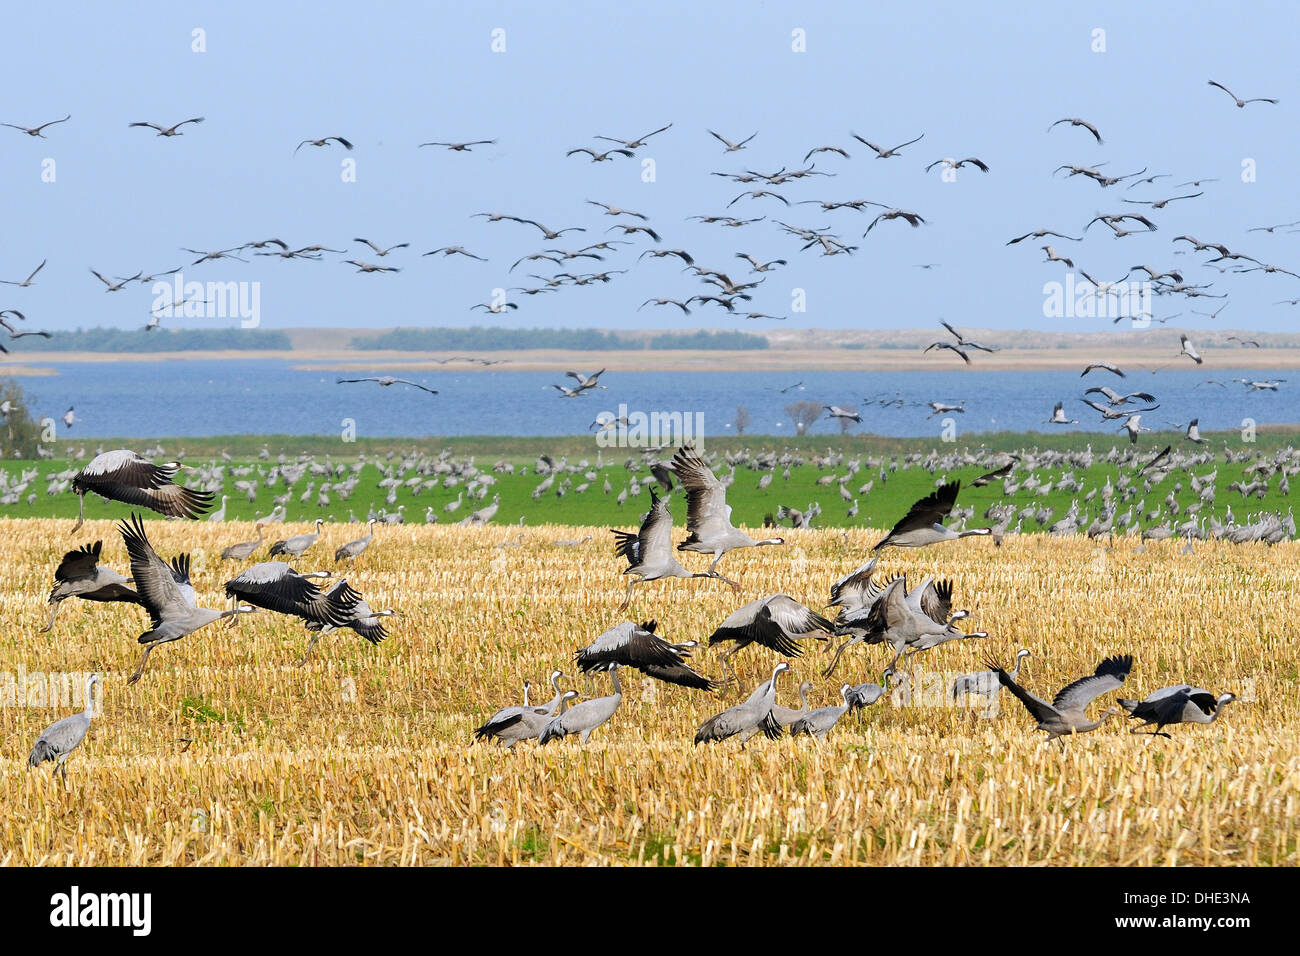 Common / Eurasian crane (Grus grus) flock taking off from maize stubble near Baltic Sea shore, Hohendorf, northern Germany. Stock Photo